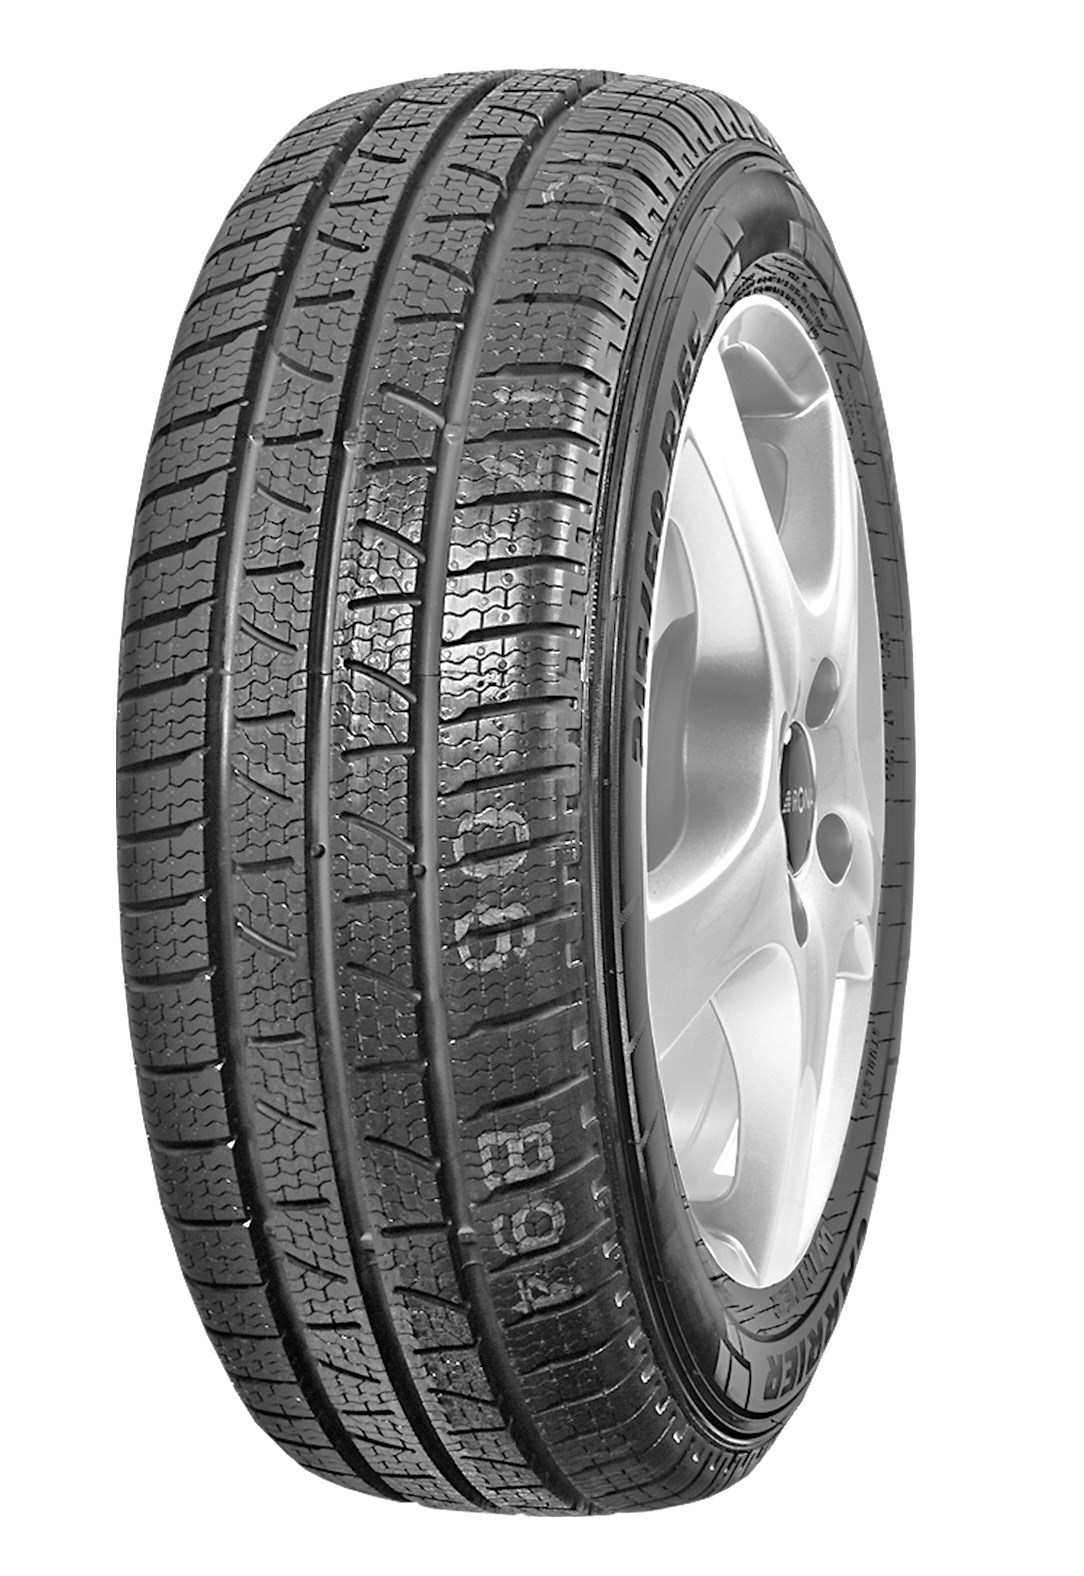 Anvelopa Iarna Pirelli Carrier Winter 235/65 R16c